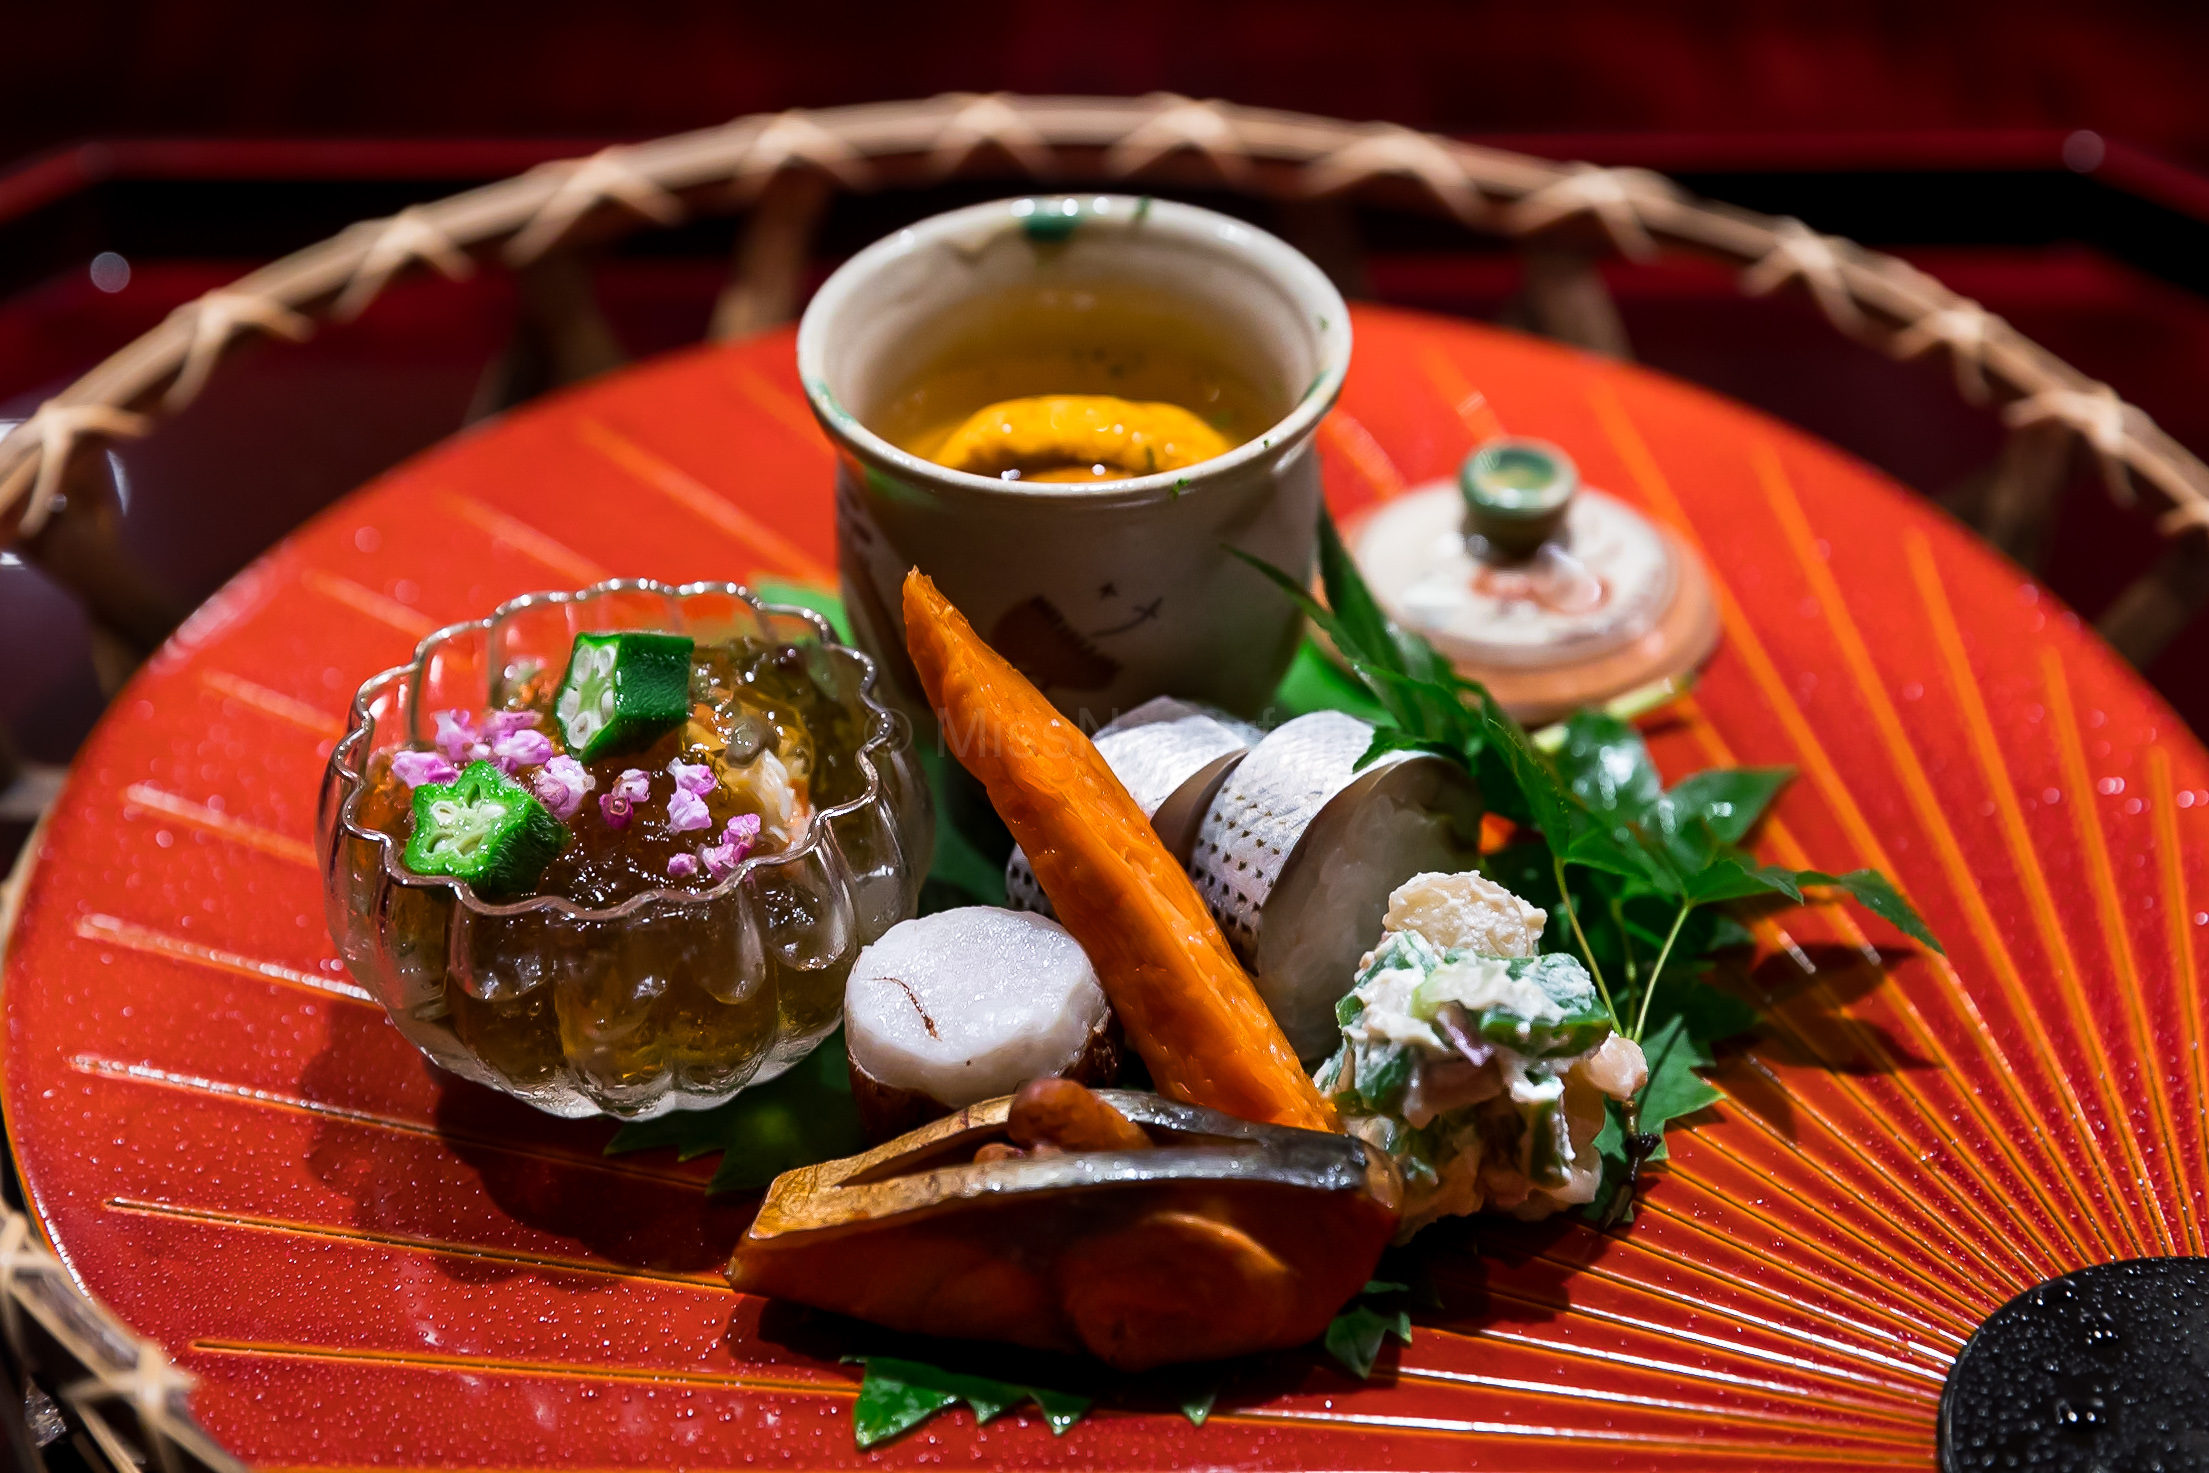 1. Murasaki uni chawanmushi, Hokkaido kegani 🦀️with dashi jelly and junsai, Kohada bozushi, Sato-imo taro, Grilled saba and walnut, Grilled bachiko, Myoga ginger and white seasame sauce